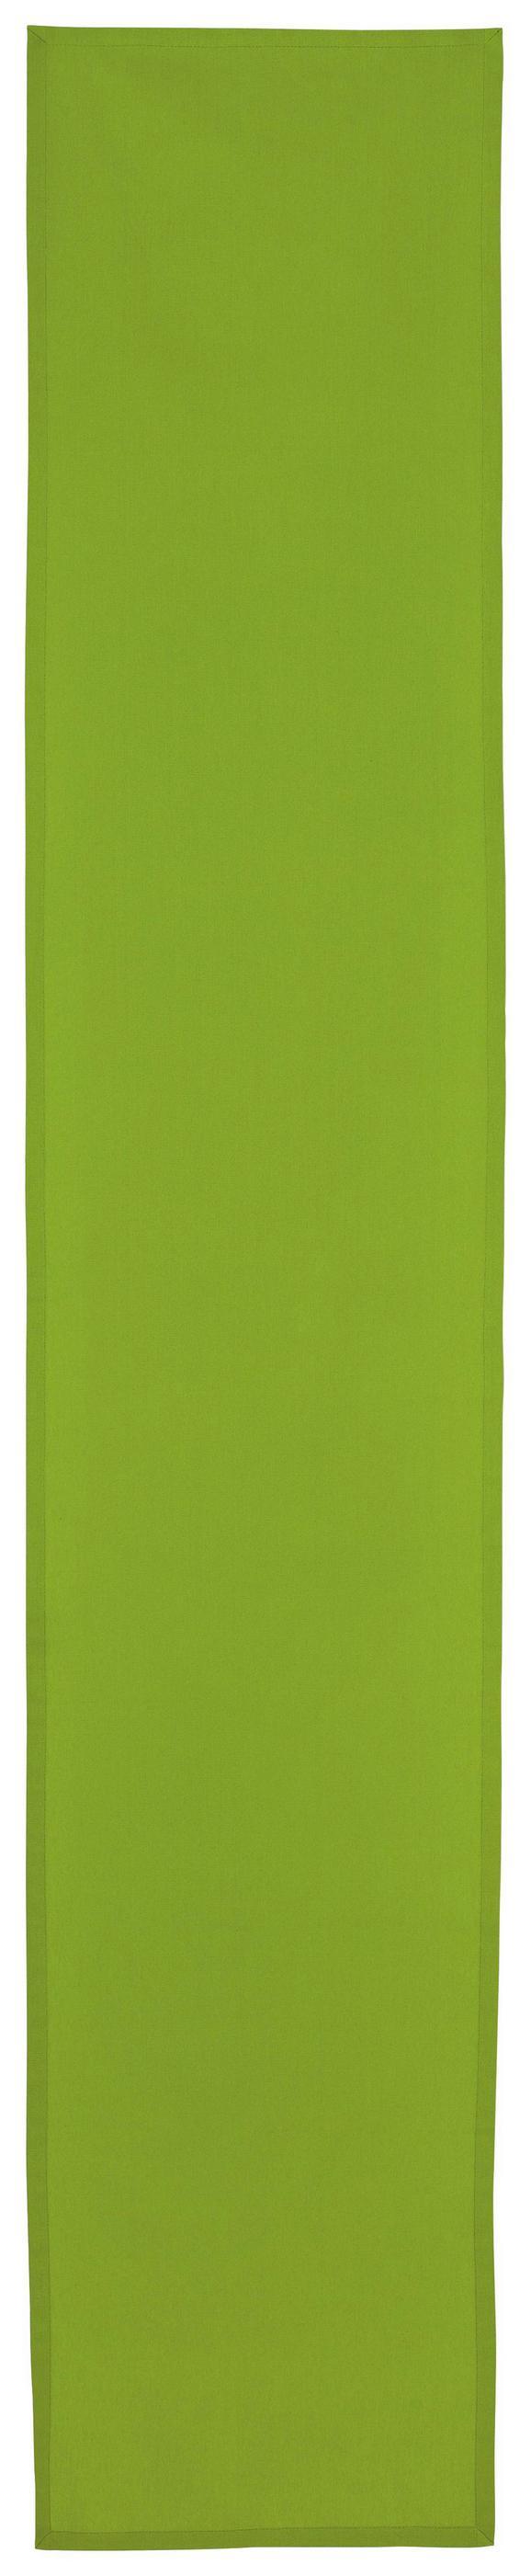 Nadprt Steffi Überlänge - zelena, tekstil (45/240cm) - MÖMAX modern living